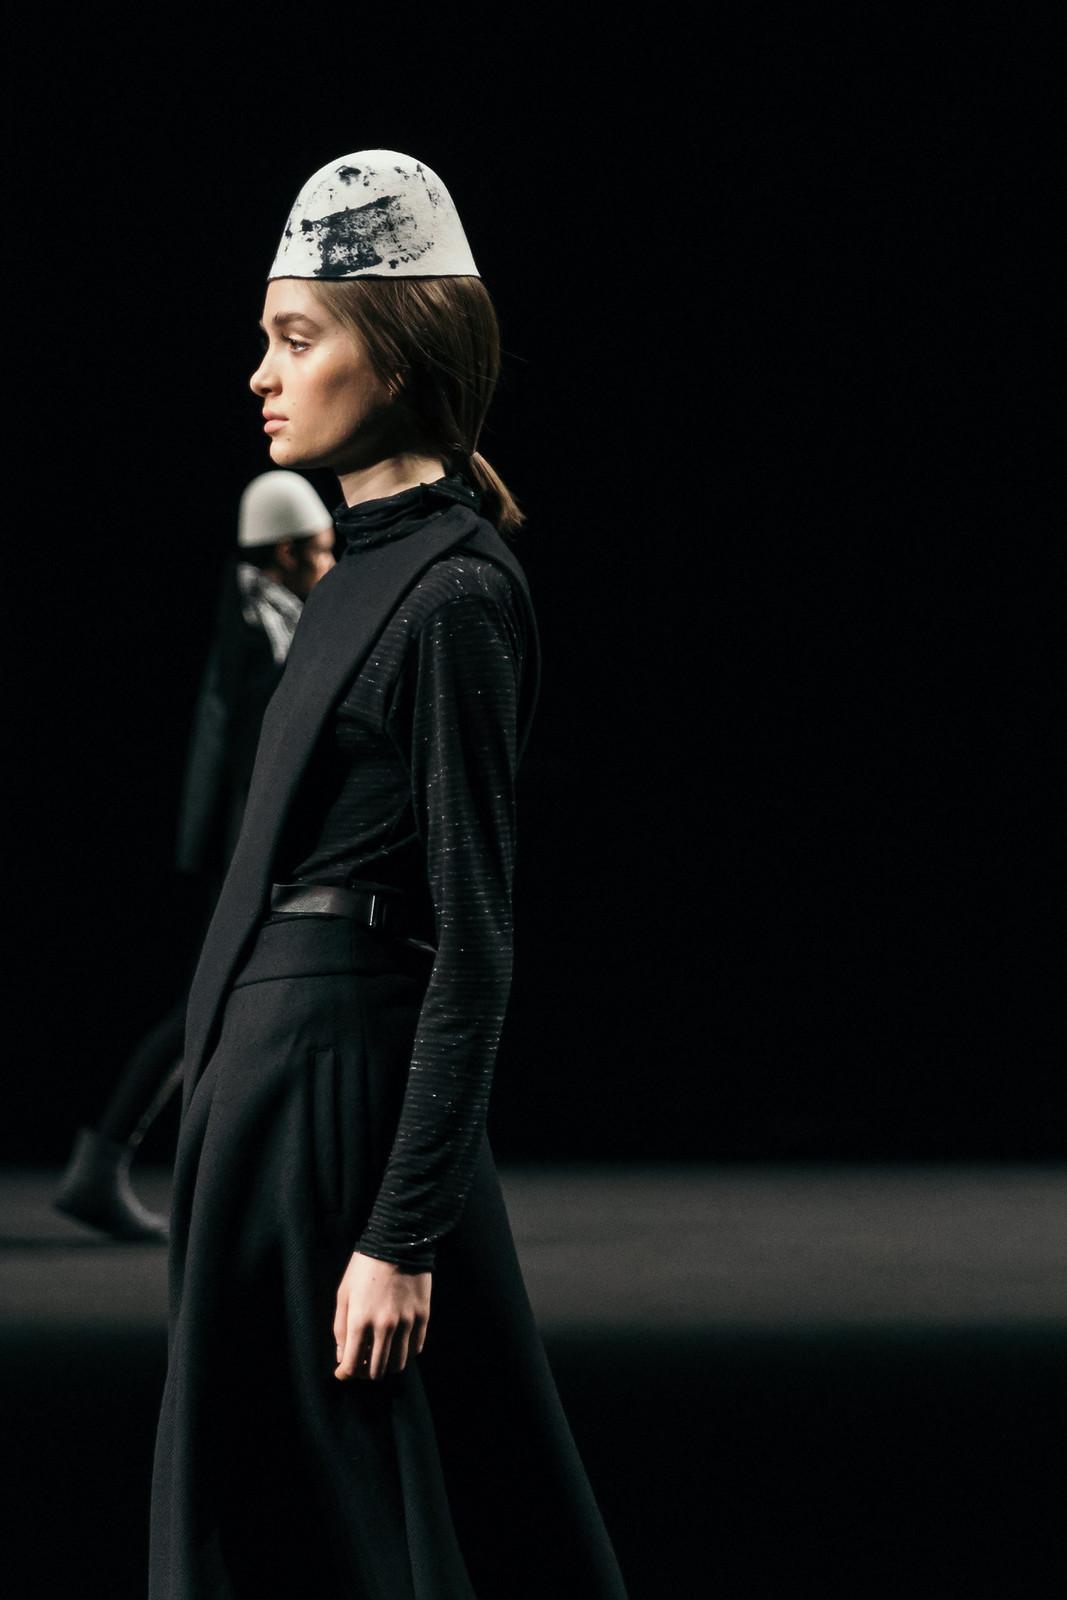 Jessie Chanes - Seams for a desire - 080 Bacelona Fashion #080bcnfasion -25